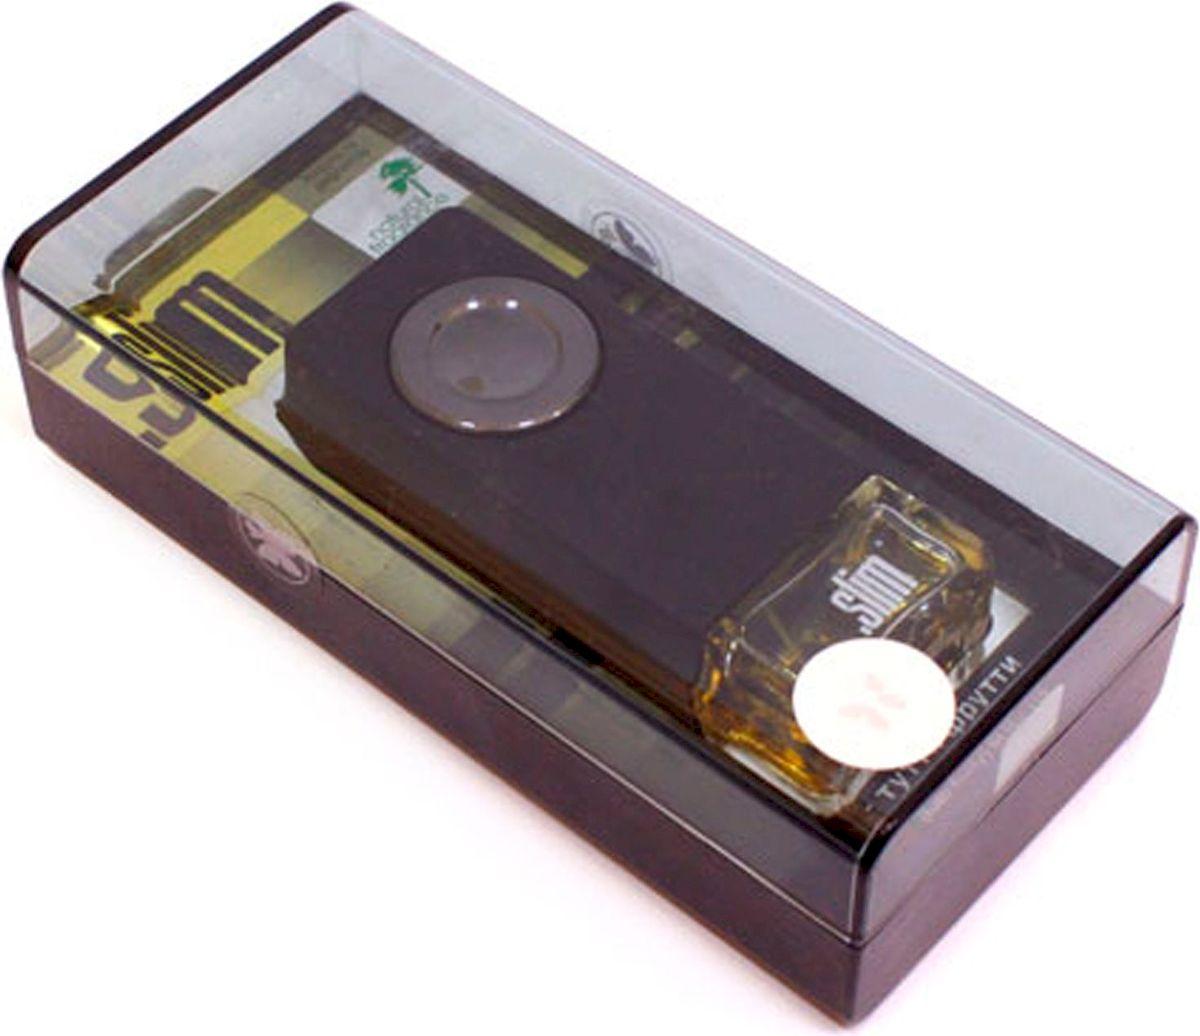 Ароматизатор автомобильный FKVJP Slim. Тутти-Фрутти, на дефлектор, 8 мл ароматизатор на дефлектор fkvjp one